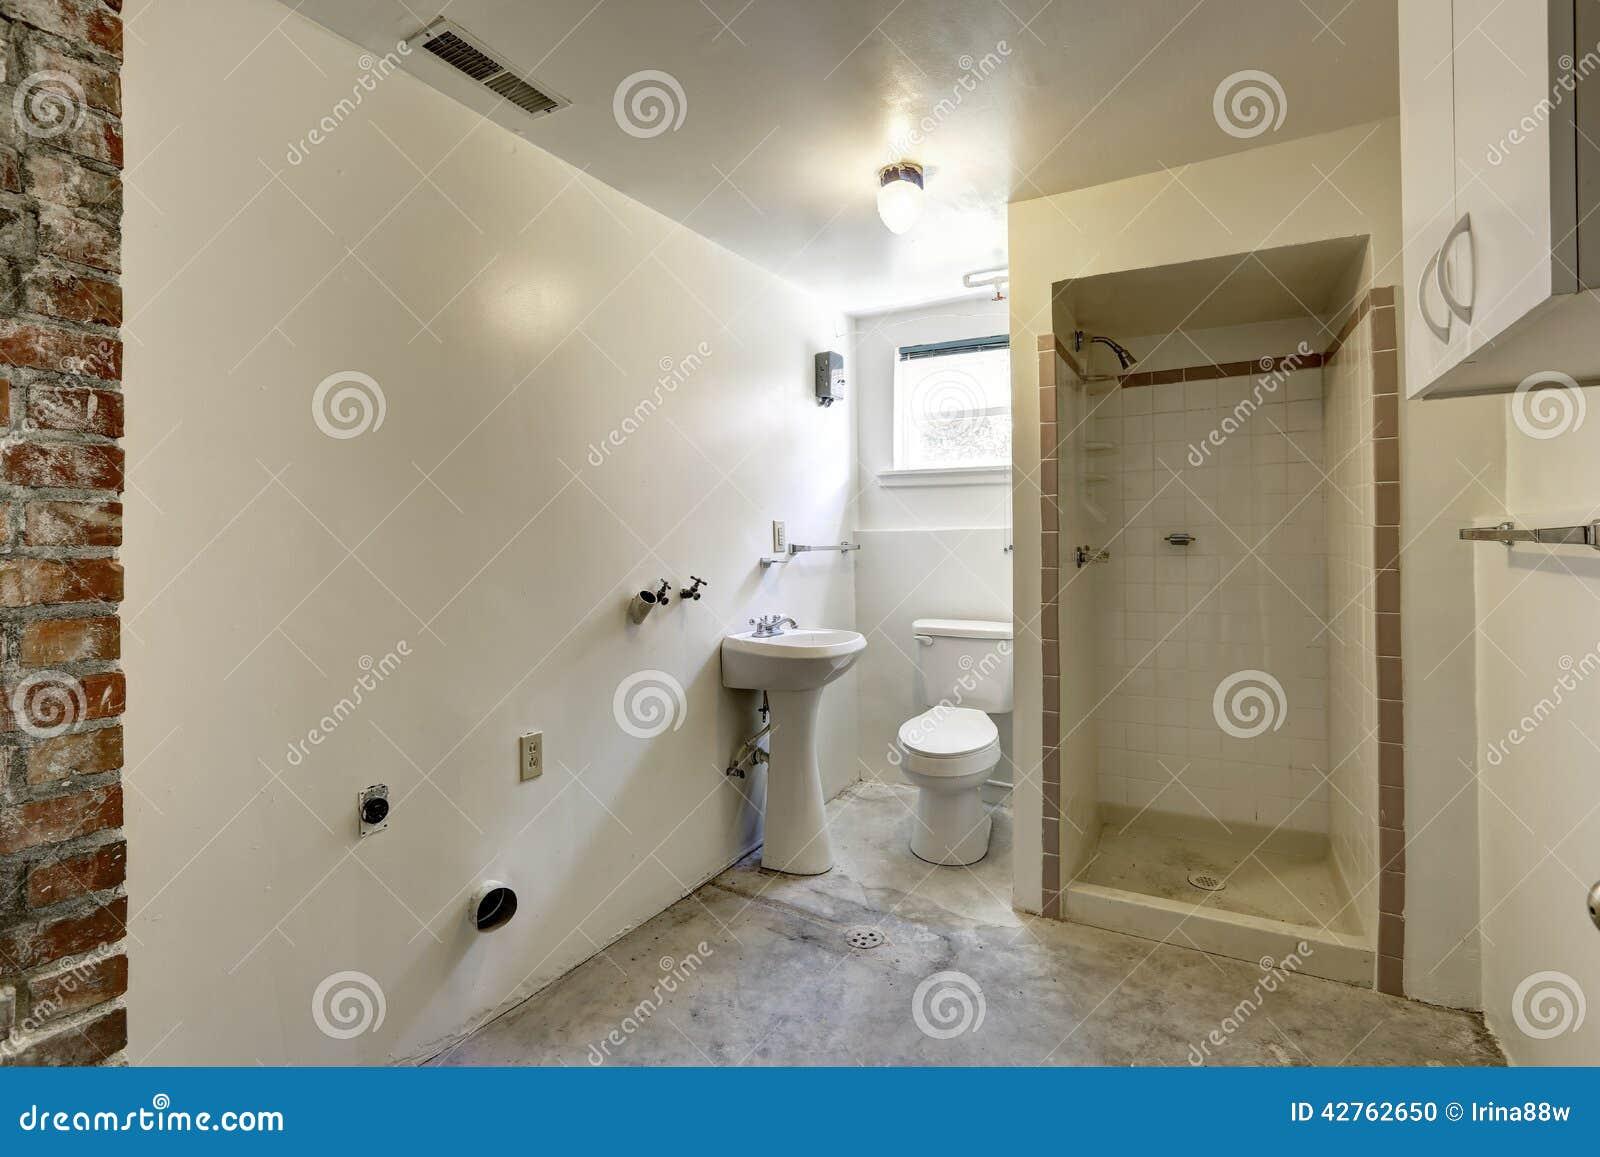 empty bathroom under construction stock photo - image: 42762650